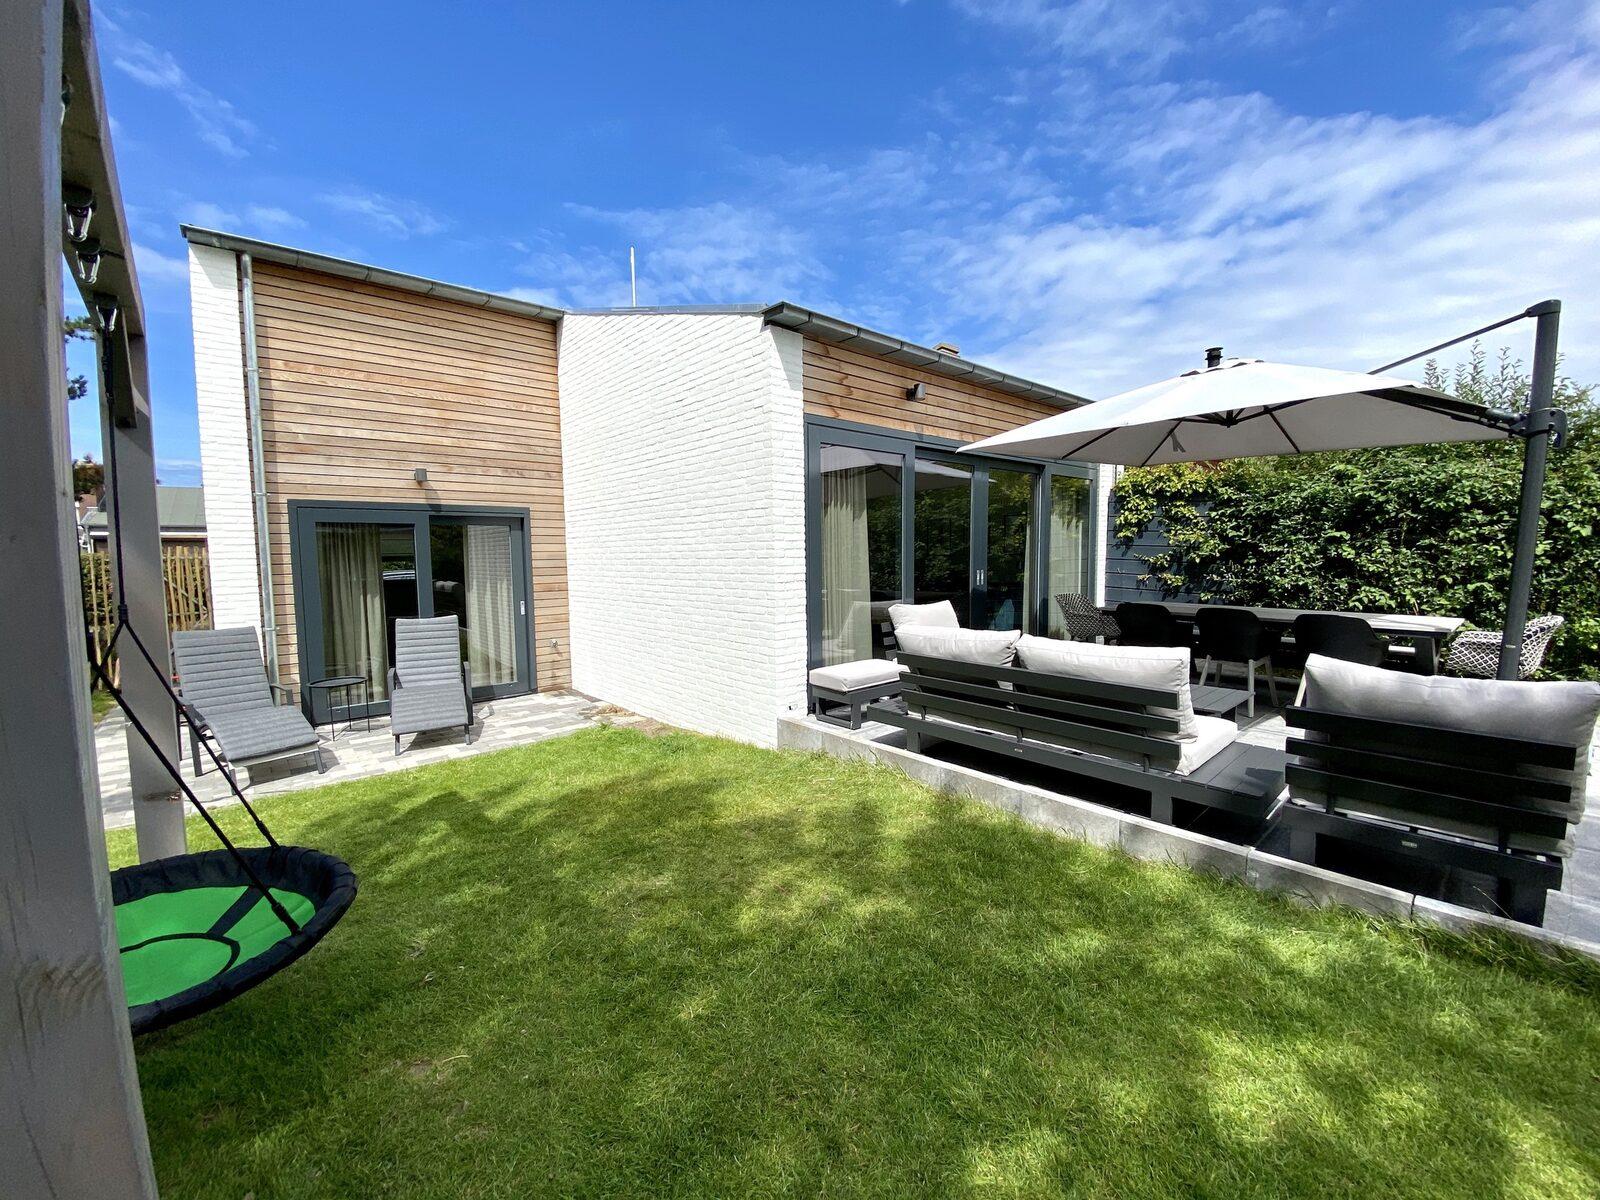 Holidayhouse - Lepelblad 44 | Nieuwvliet-Bad